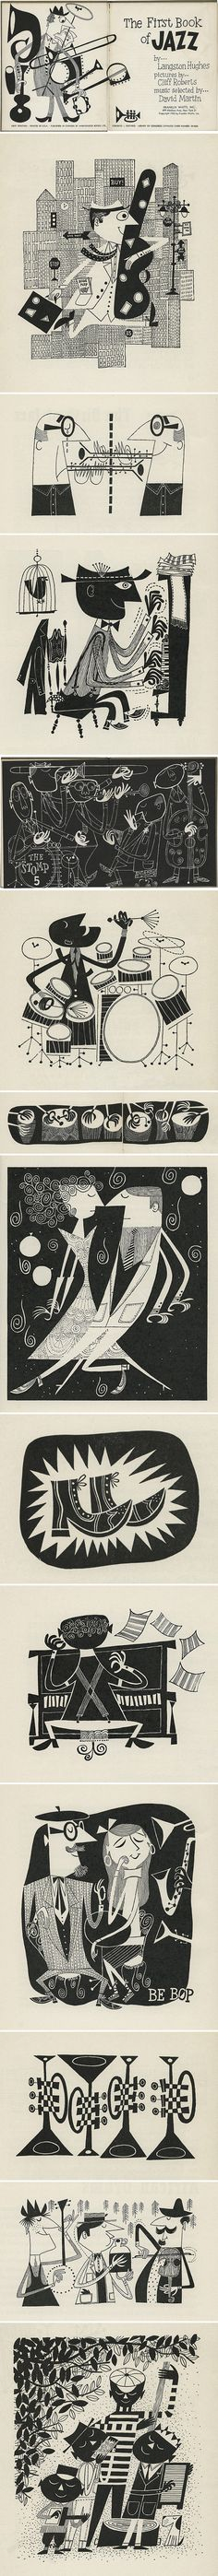 ilustracion por, primer libro, art, book, jazz illustration, cliff robert, de jazz, el primer, langston hugh